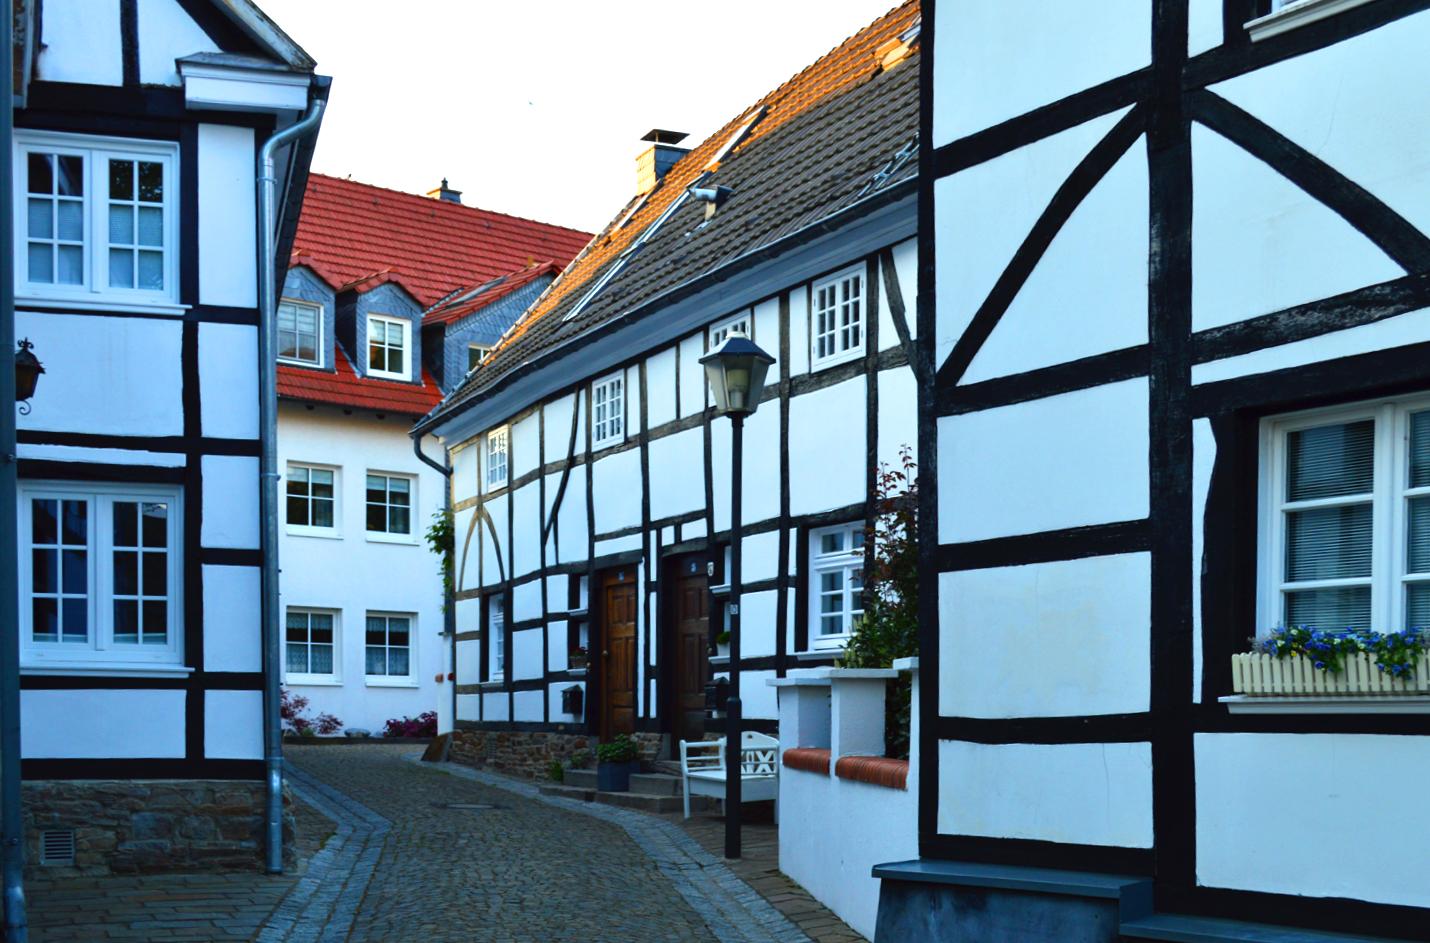 Kettwig street